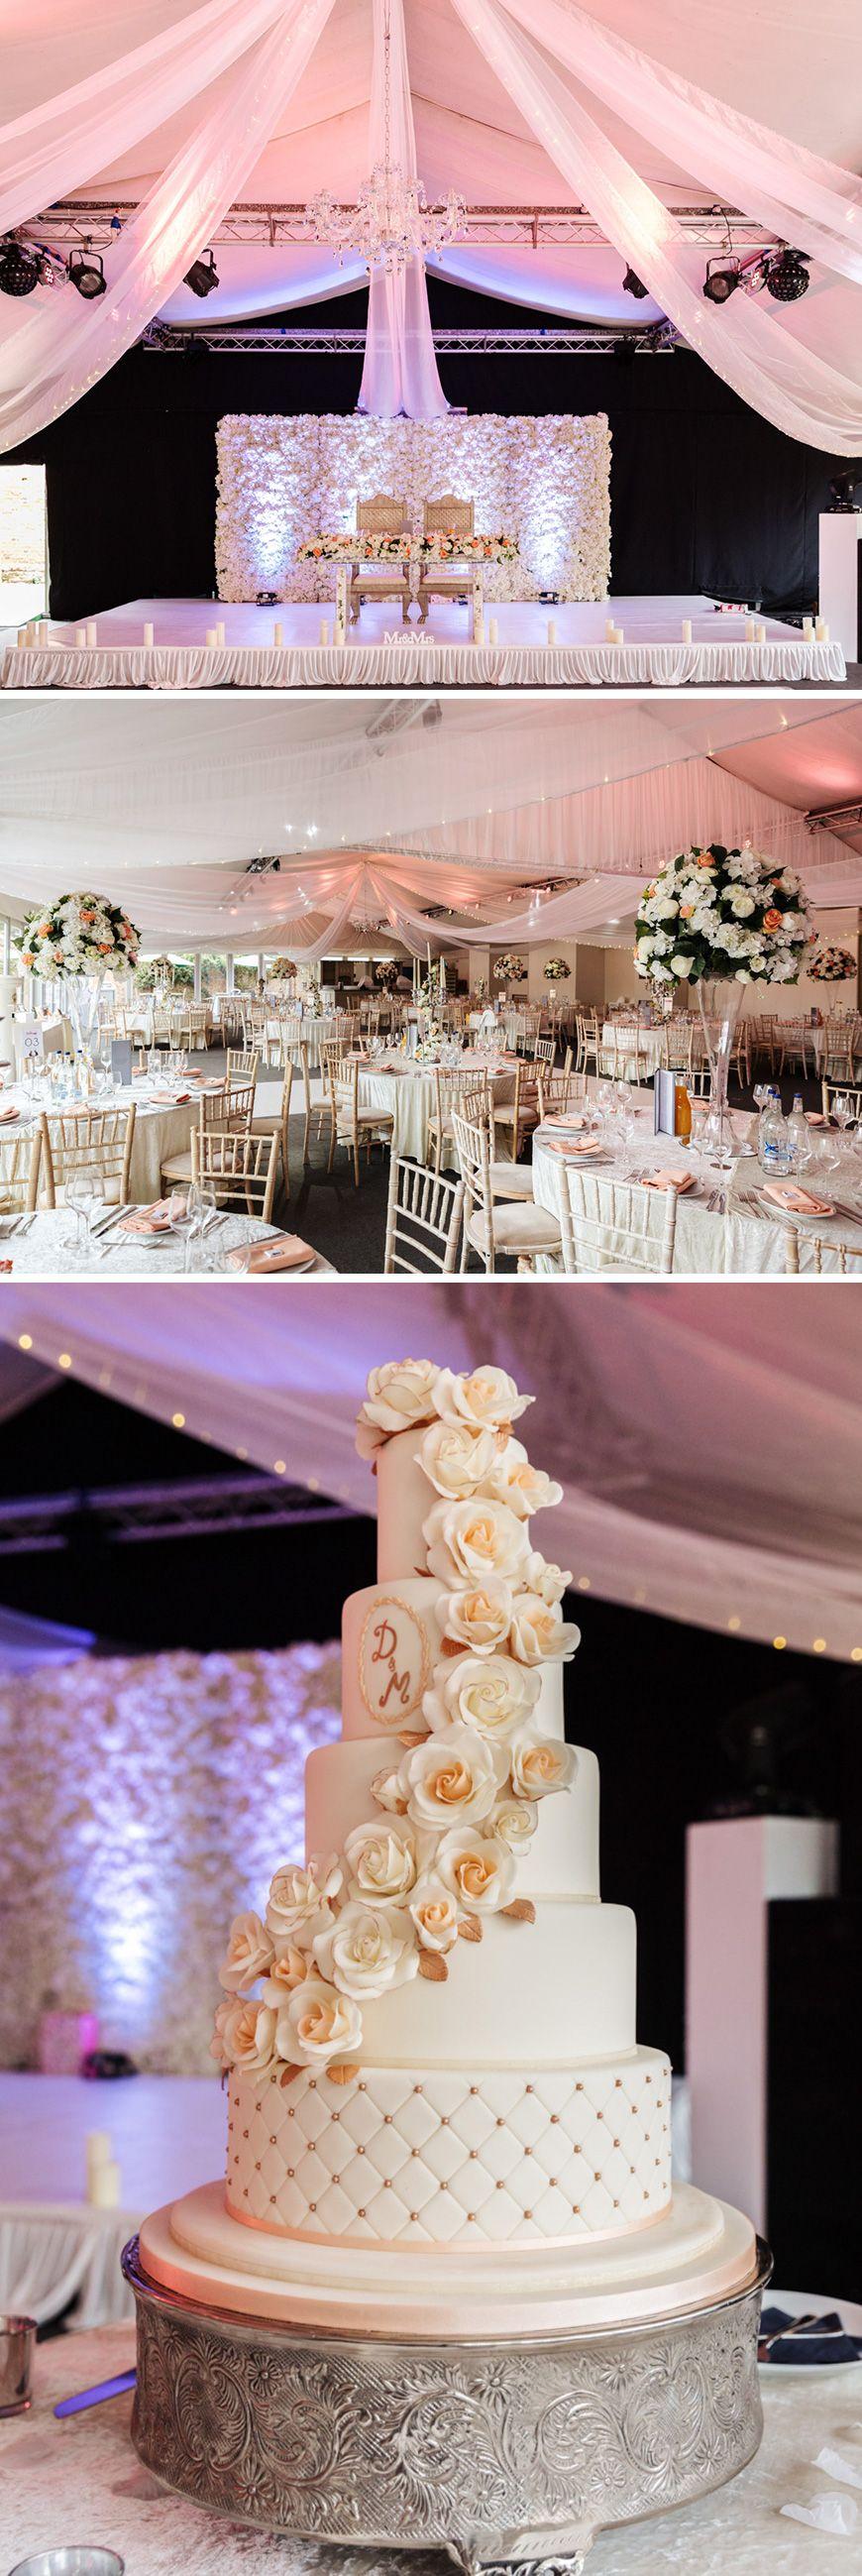 Real Wedding - Mohini and David's Glorious Summer Wedding ...